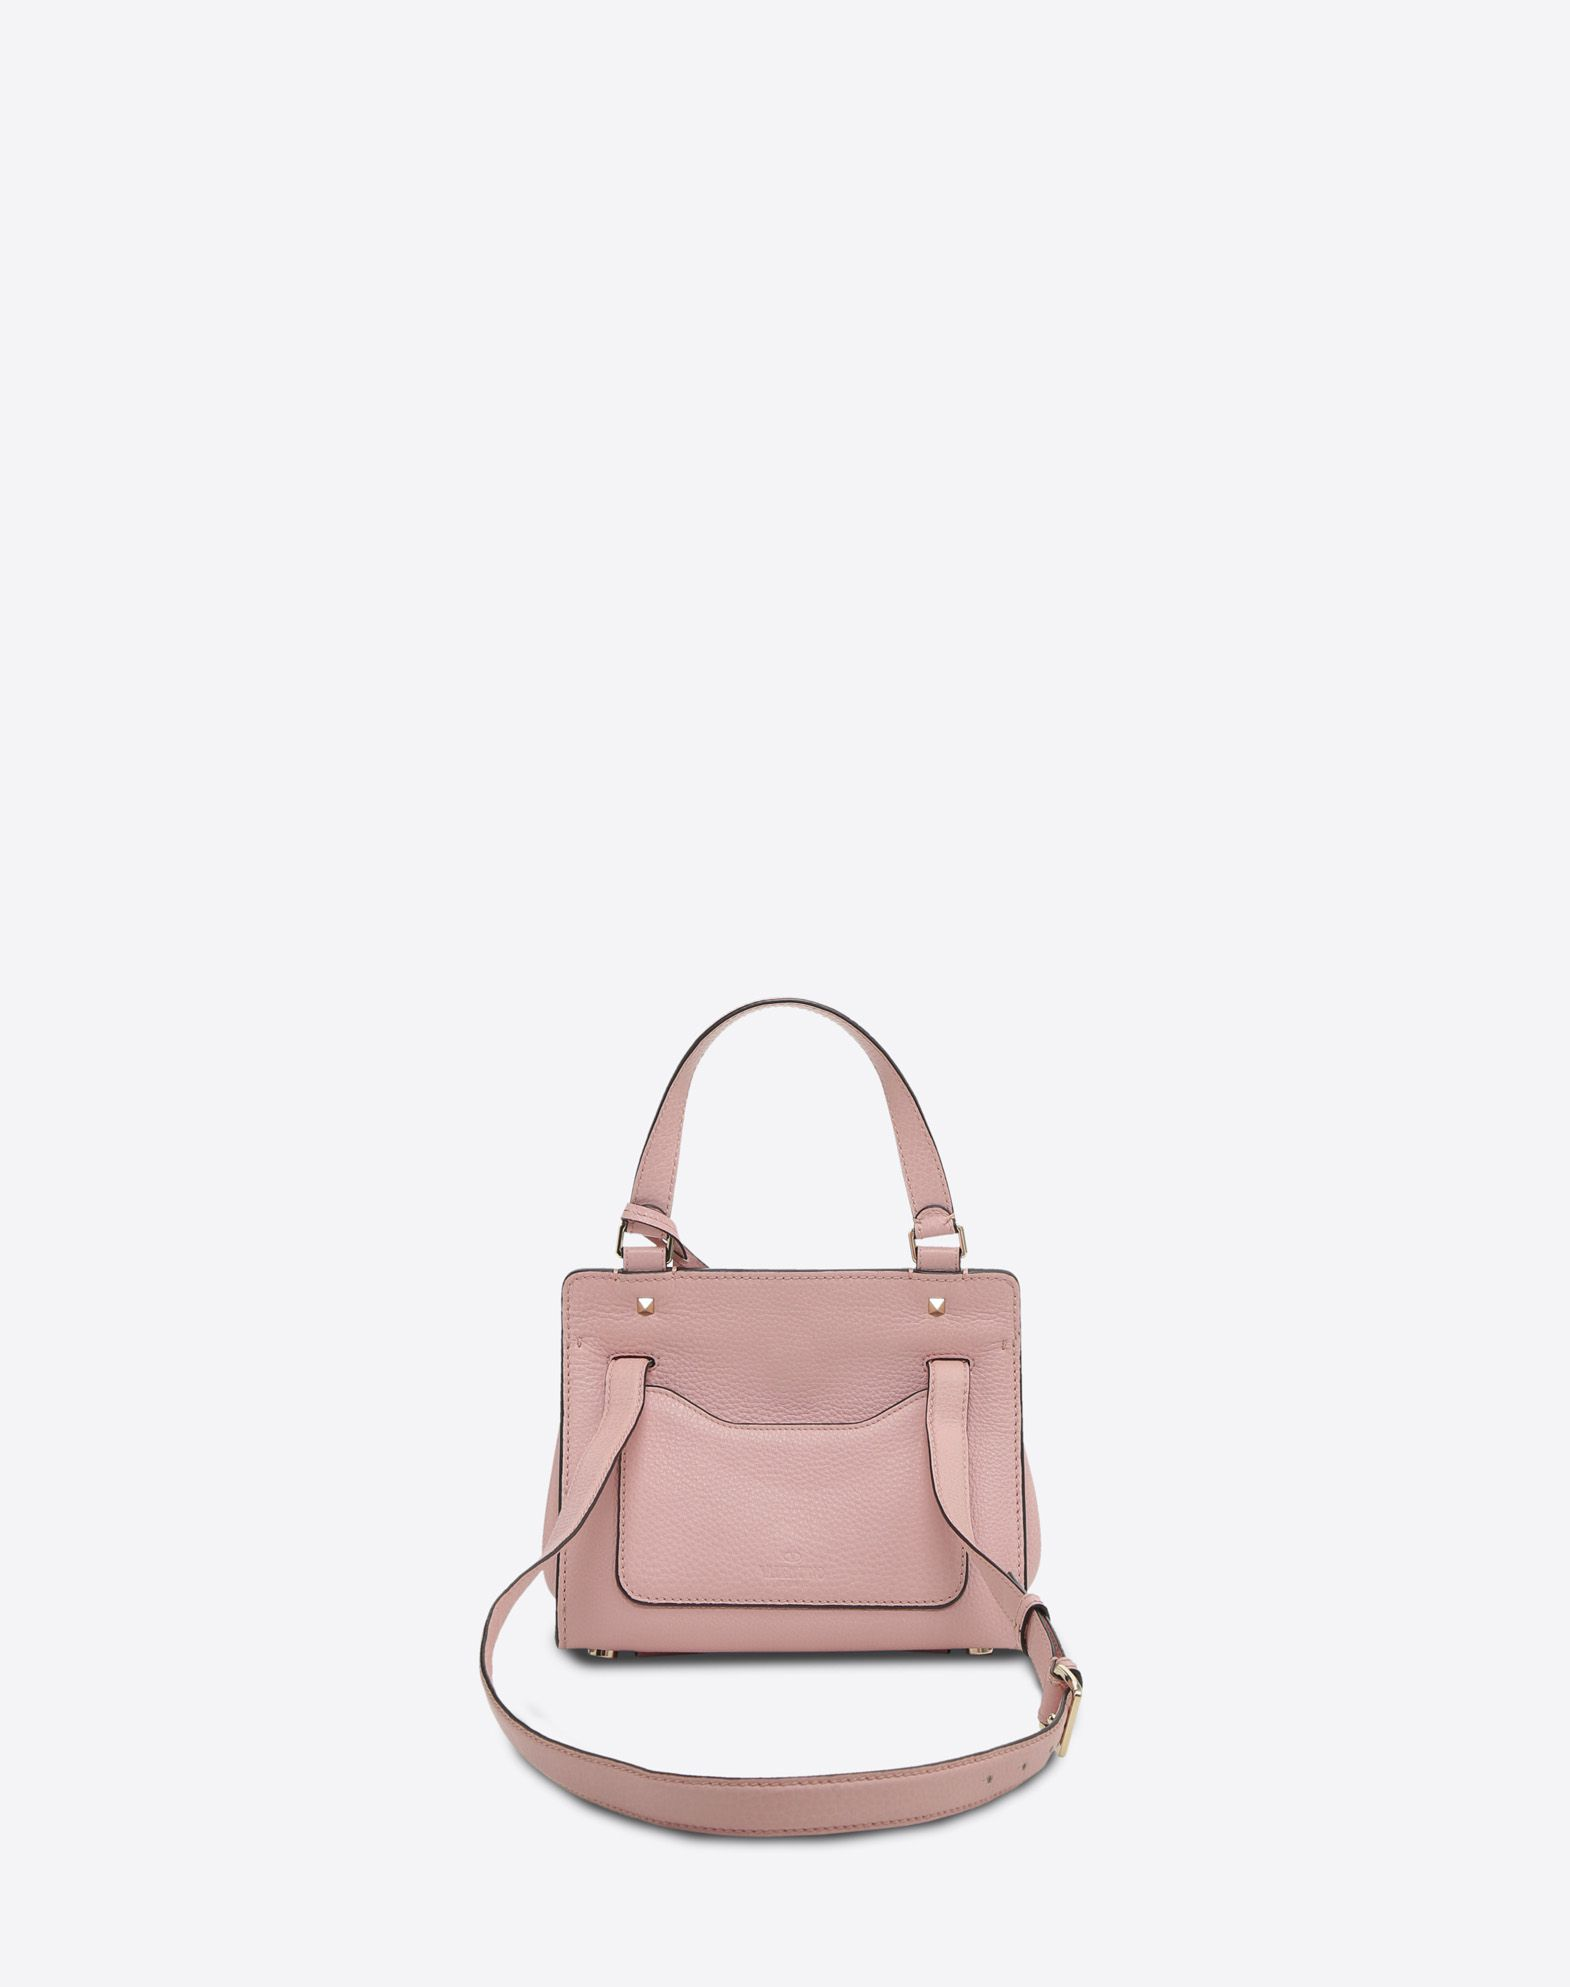 VALENTINO GARAVANI Joylock Small Handle Bag HANDBAG D d